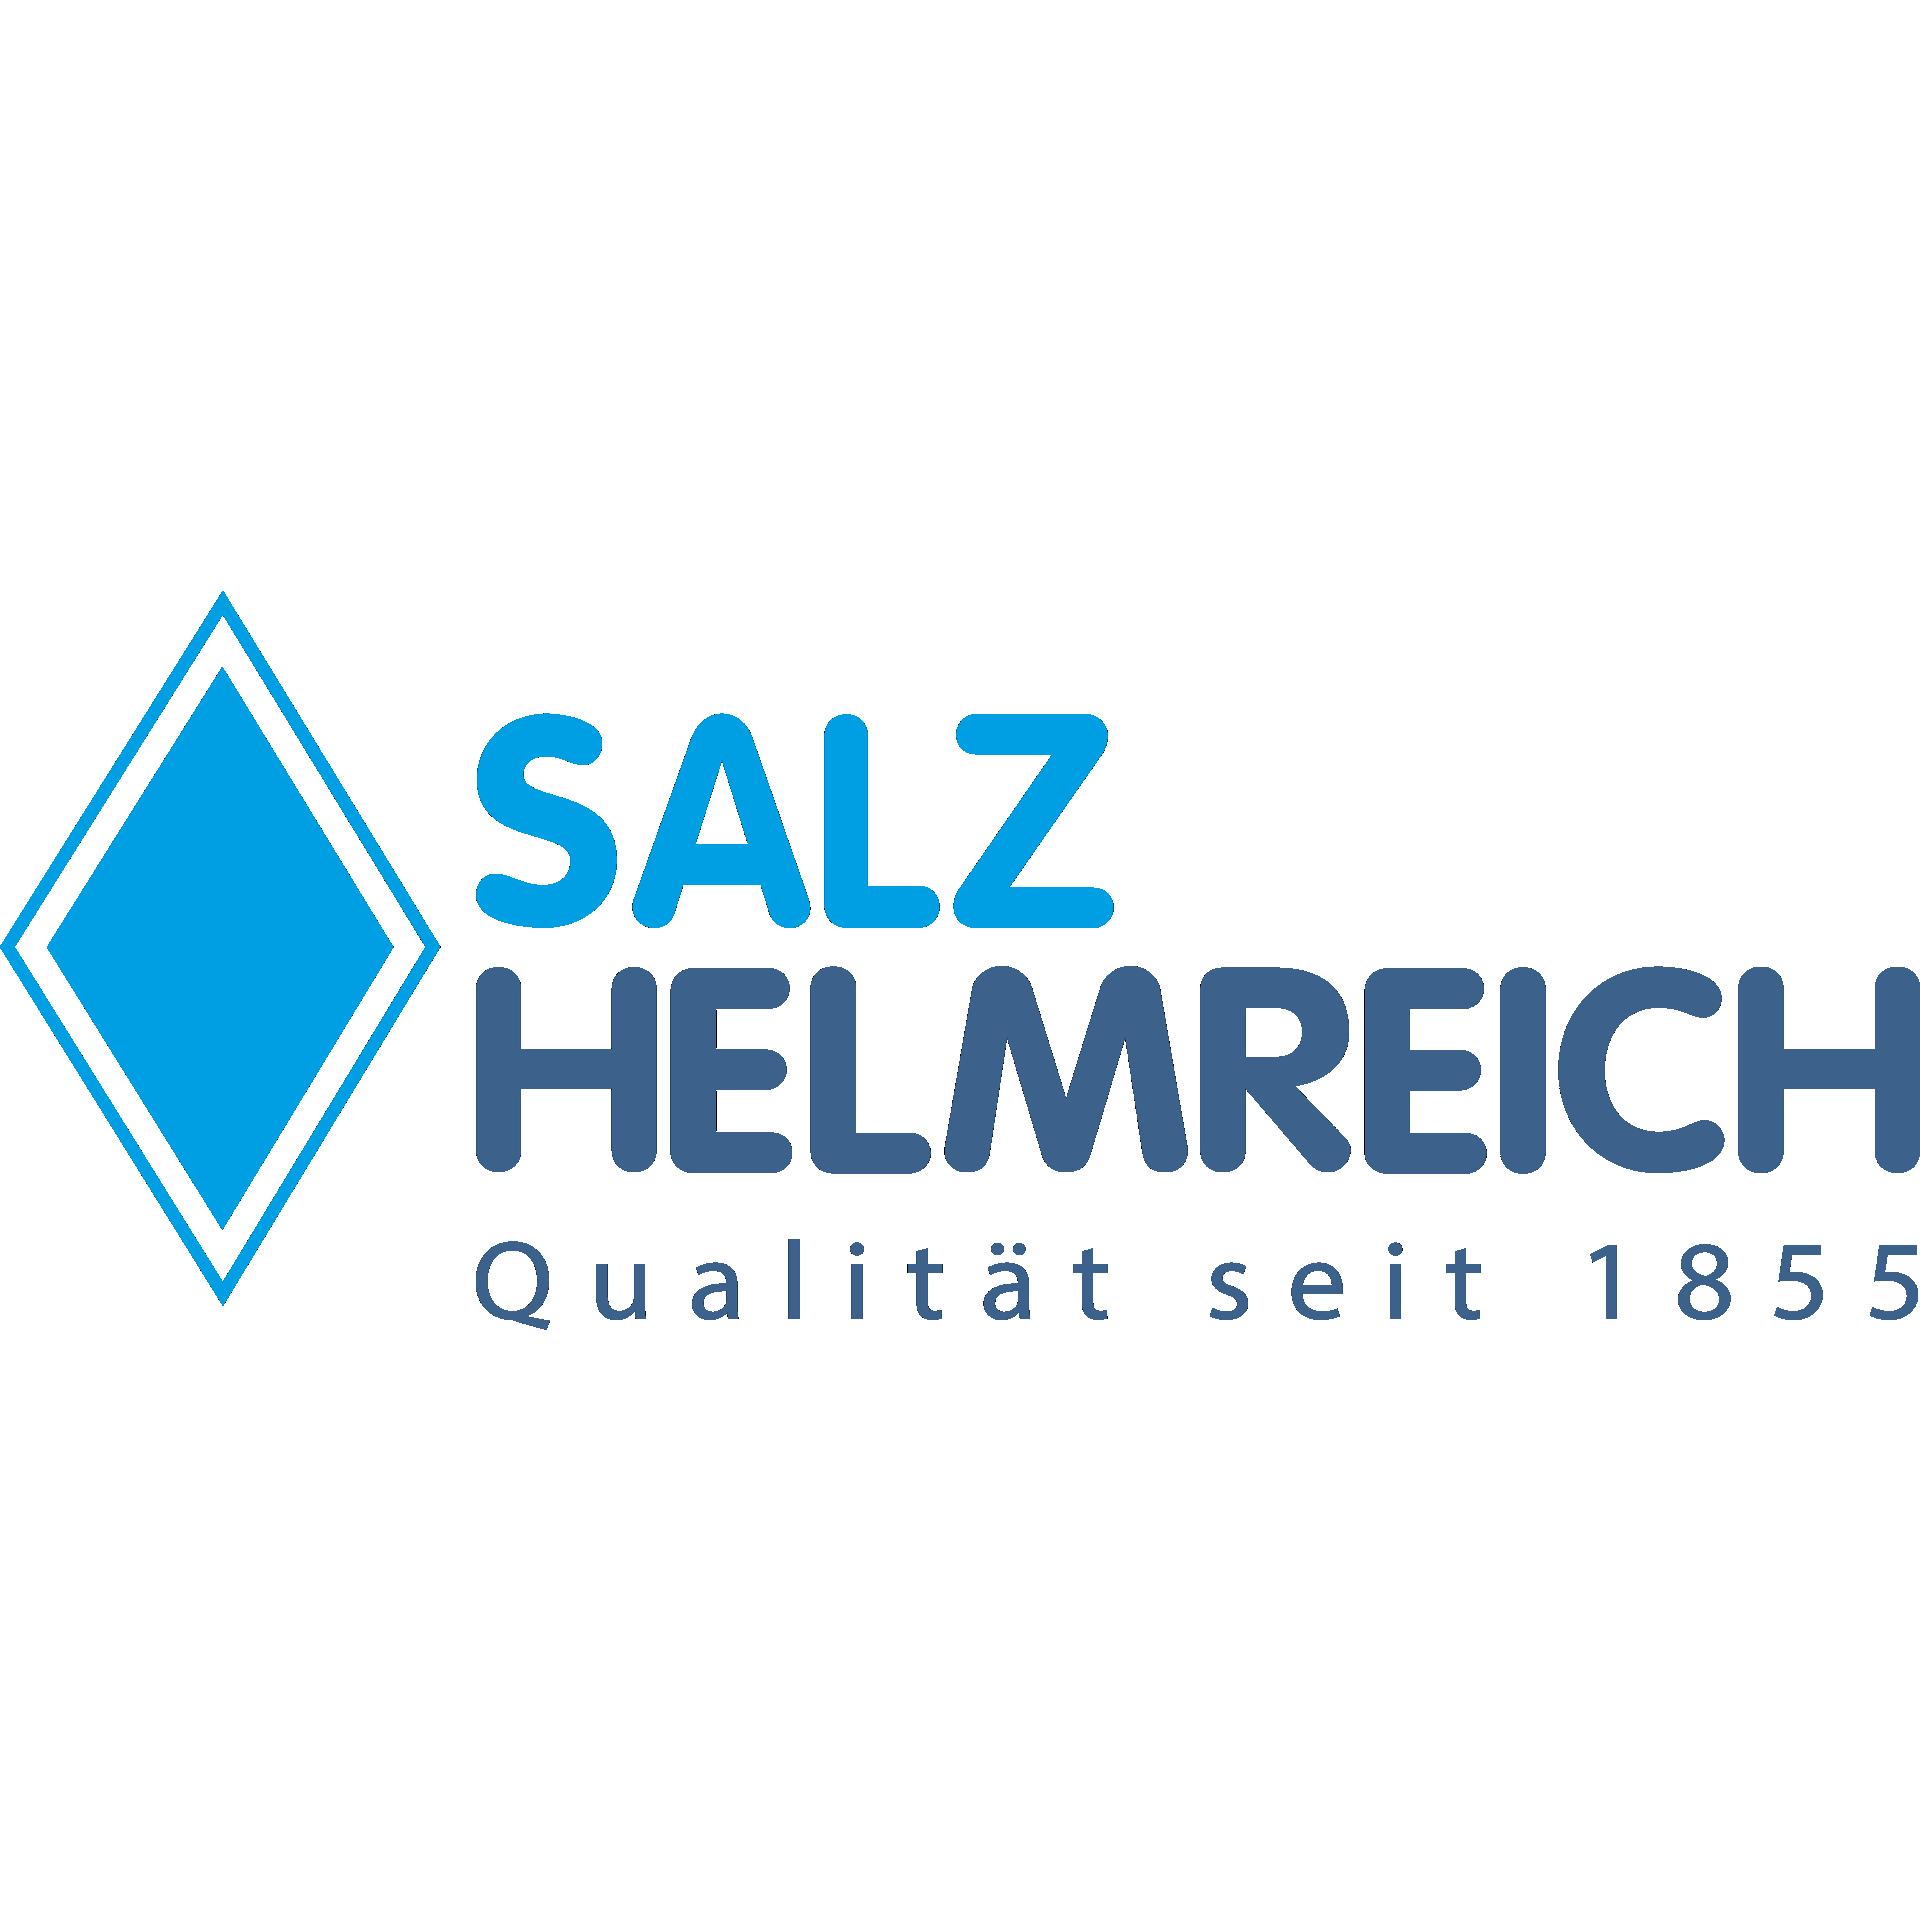 Salz Helmreich Broxo Salz-Granulat 6-15 nach DIN EN 973 Typ A im 25kg Sack 28042-30